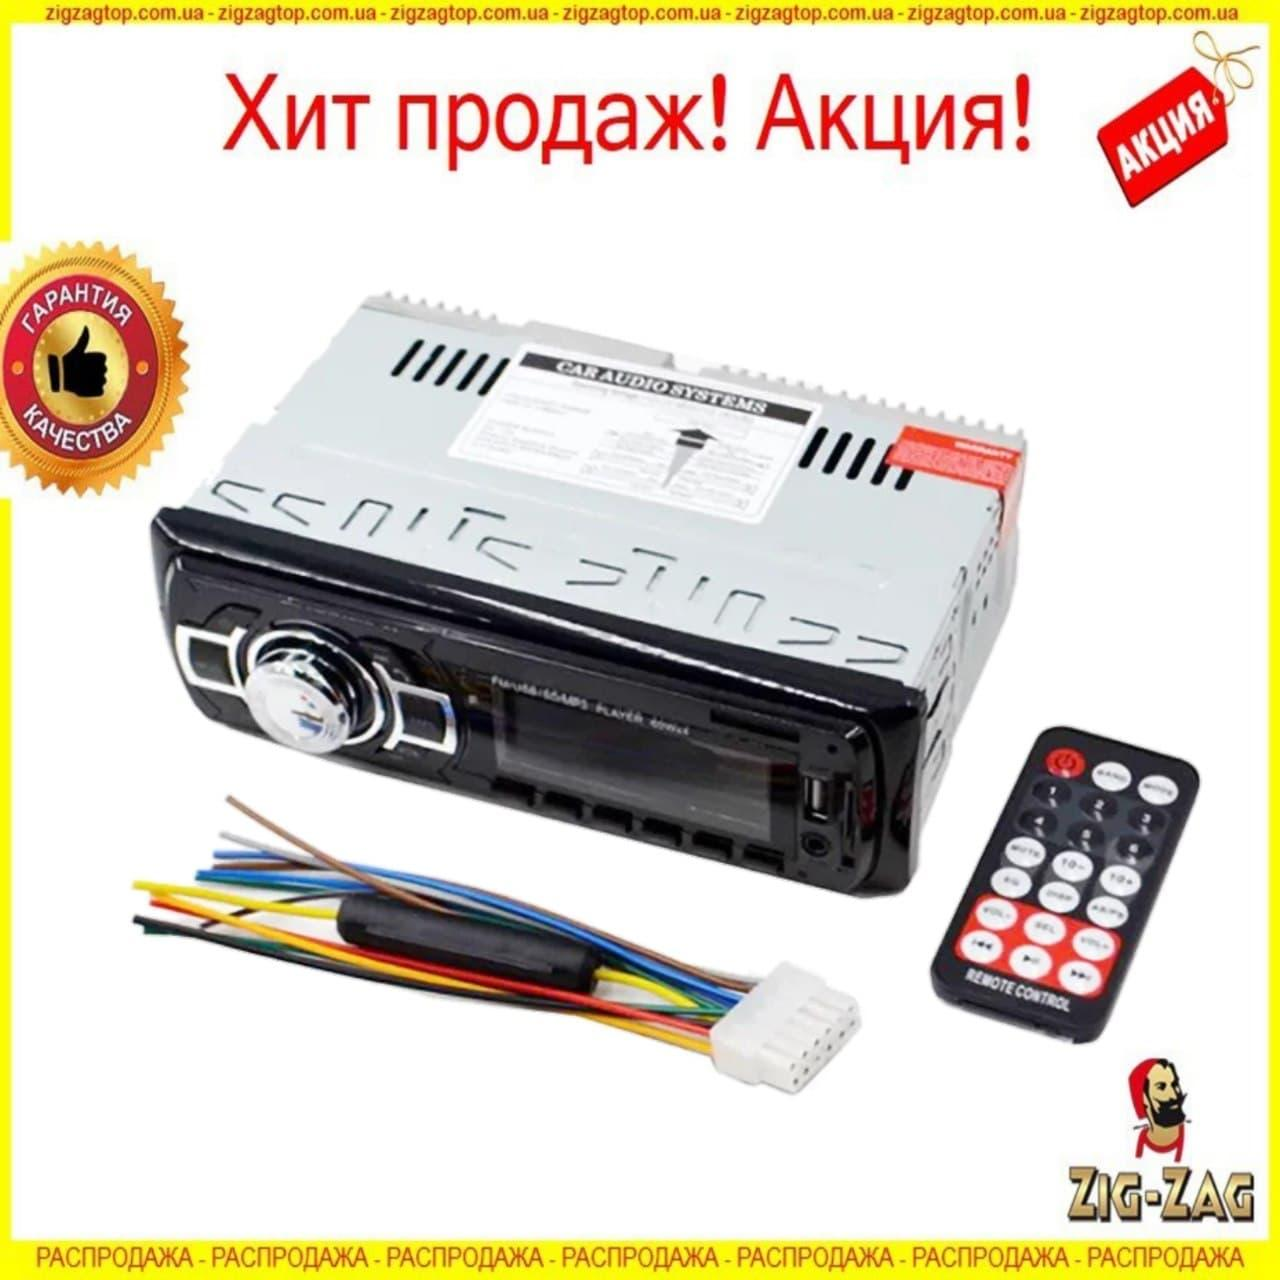 Автомобильная Магнитола 1DIN Atlanfa AT-1403 FM+USB+TF CARD Автомагнитола Атланфа в Машину, Авто КАЧЕСТВО!